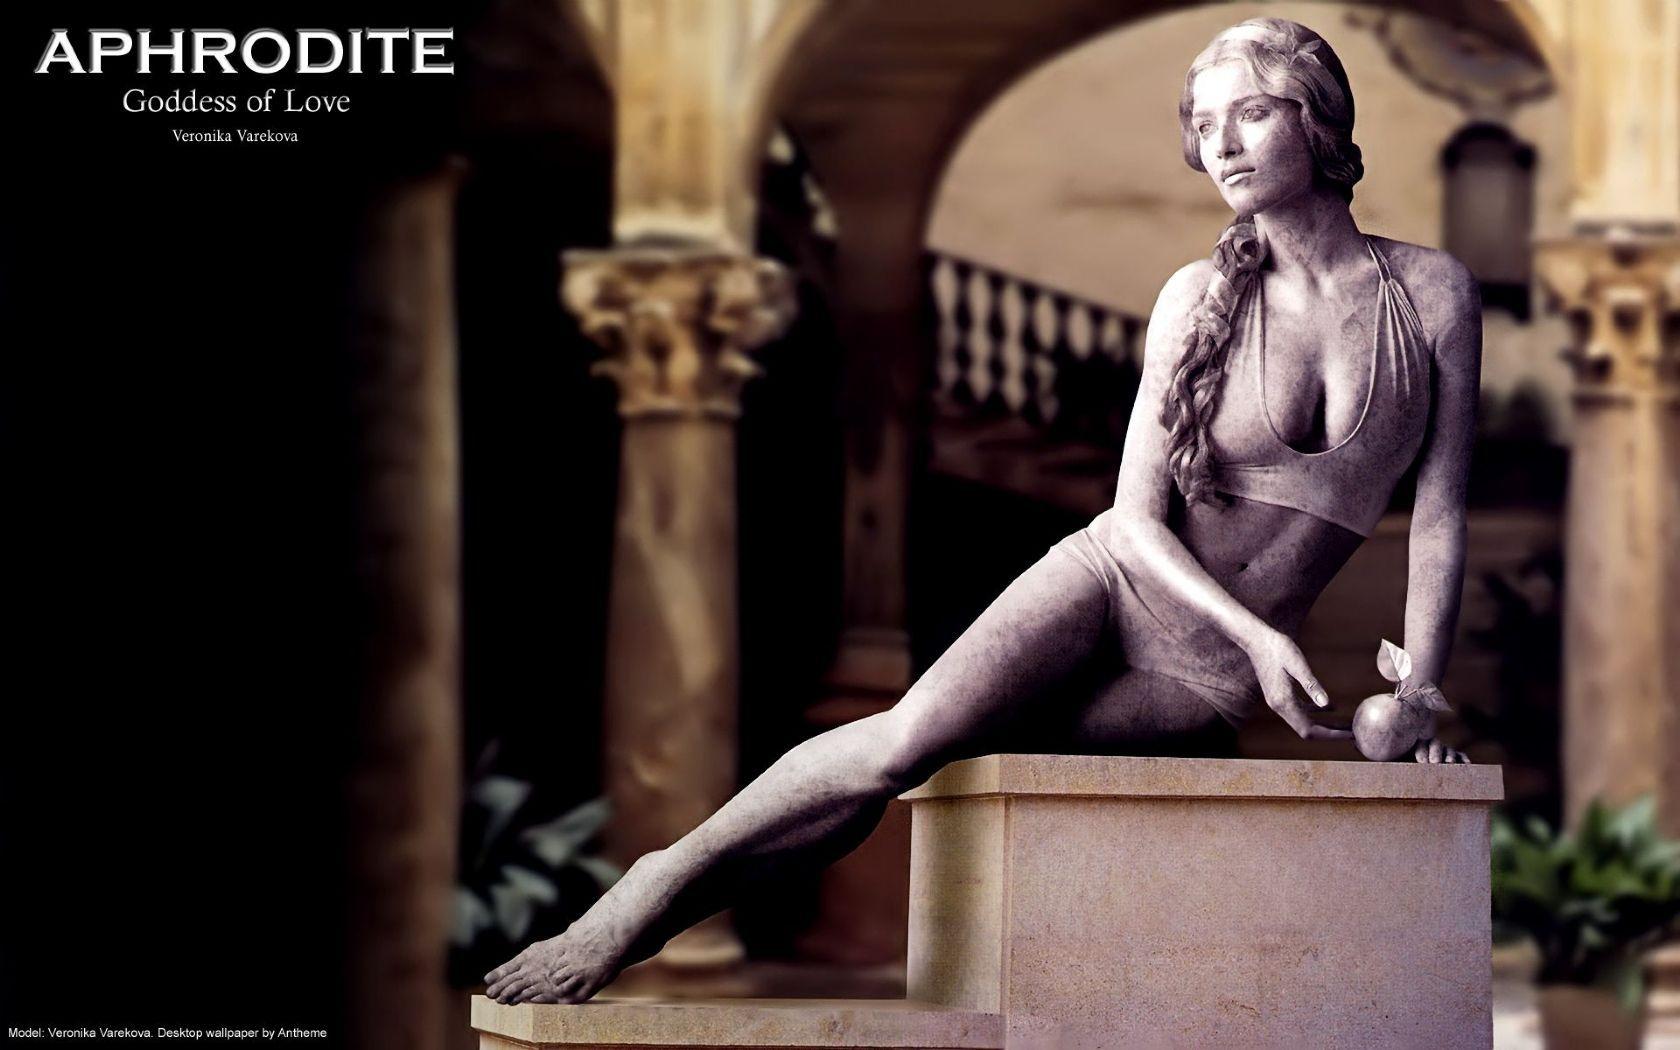 Aphrodite Goddess of Love Computer Wallpapers Desktop Backgrounds 1680x1050